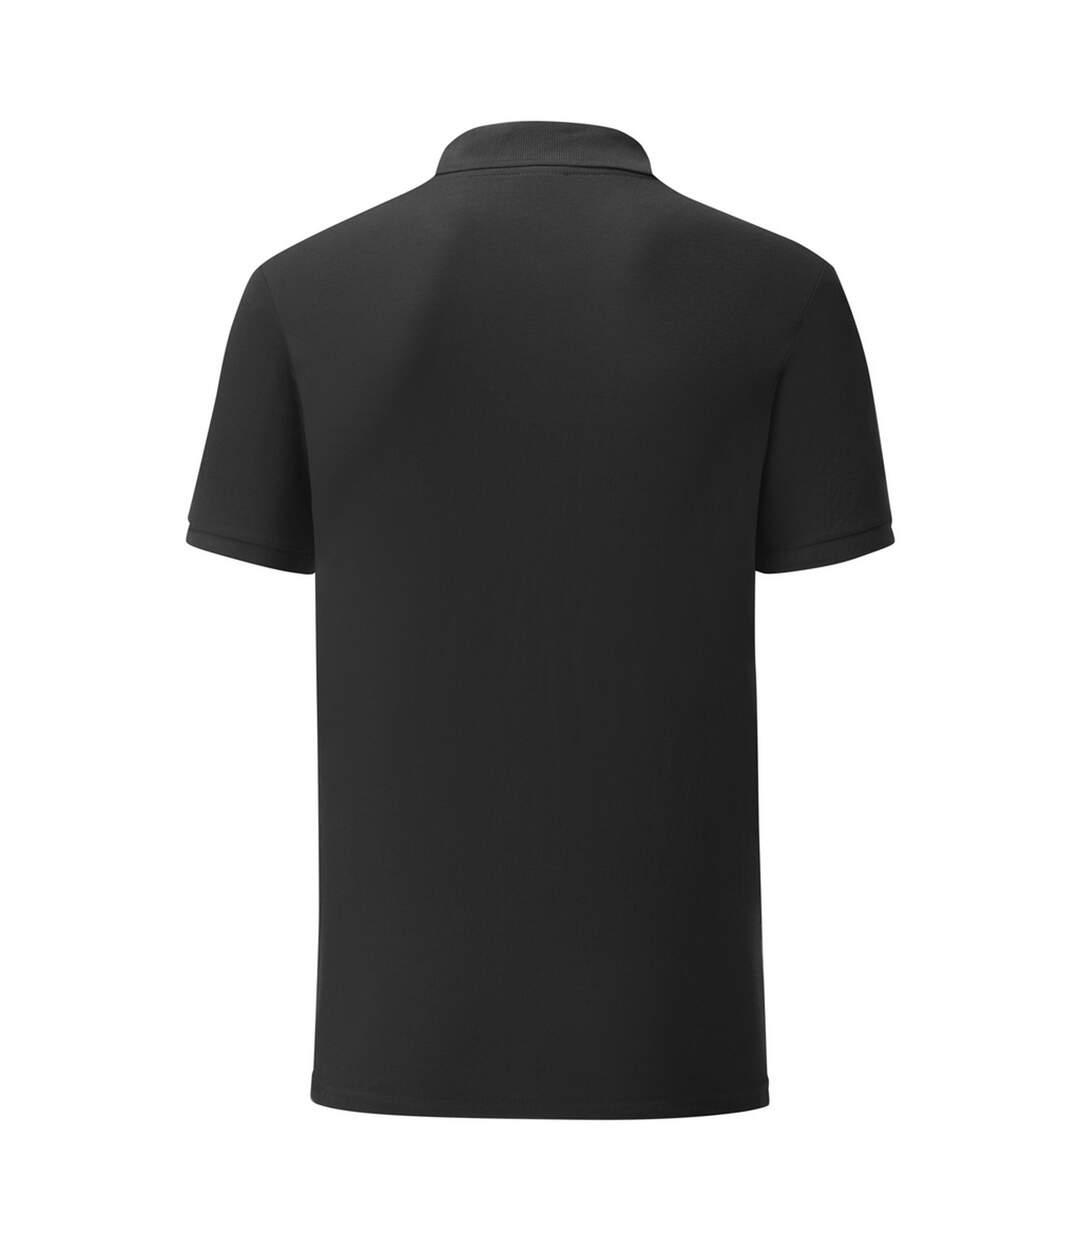 Fruit Of The Loom Mens Tailored Poly/Cotton Piqu Polo Shirt (Black) - UTPC3572